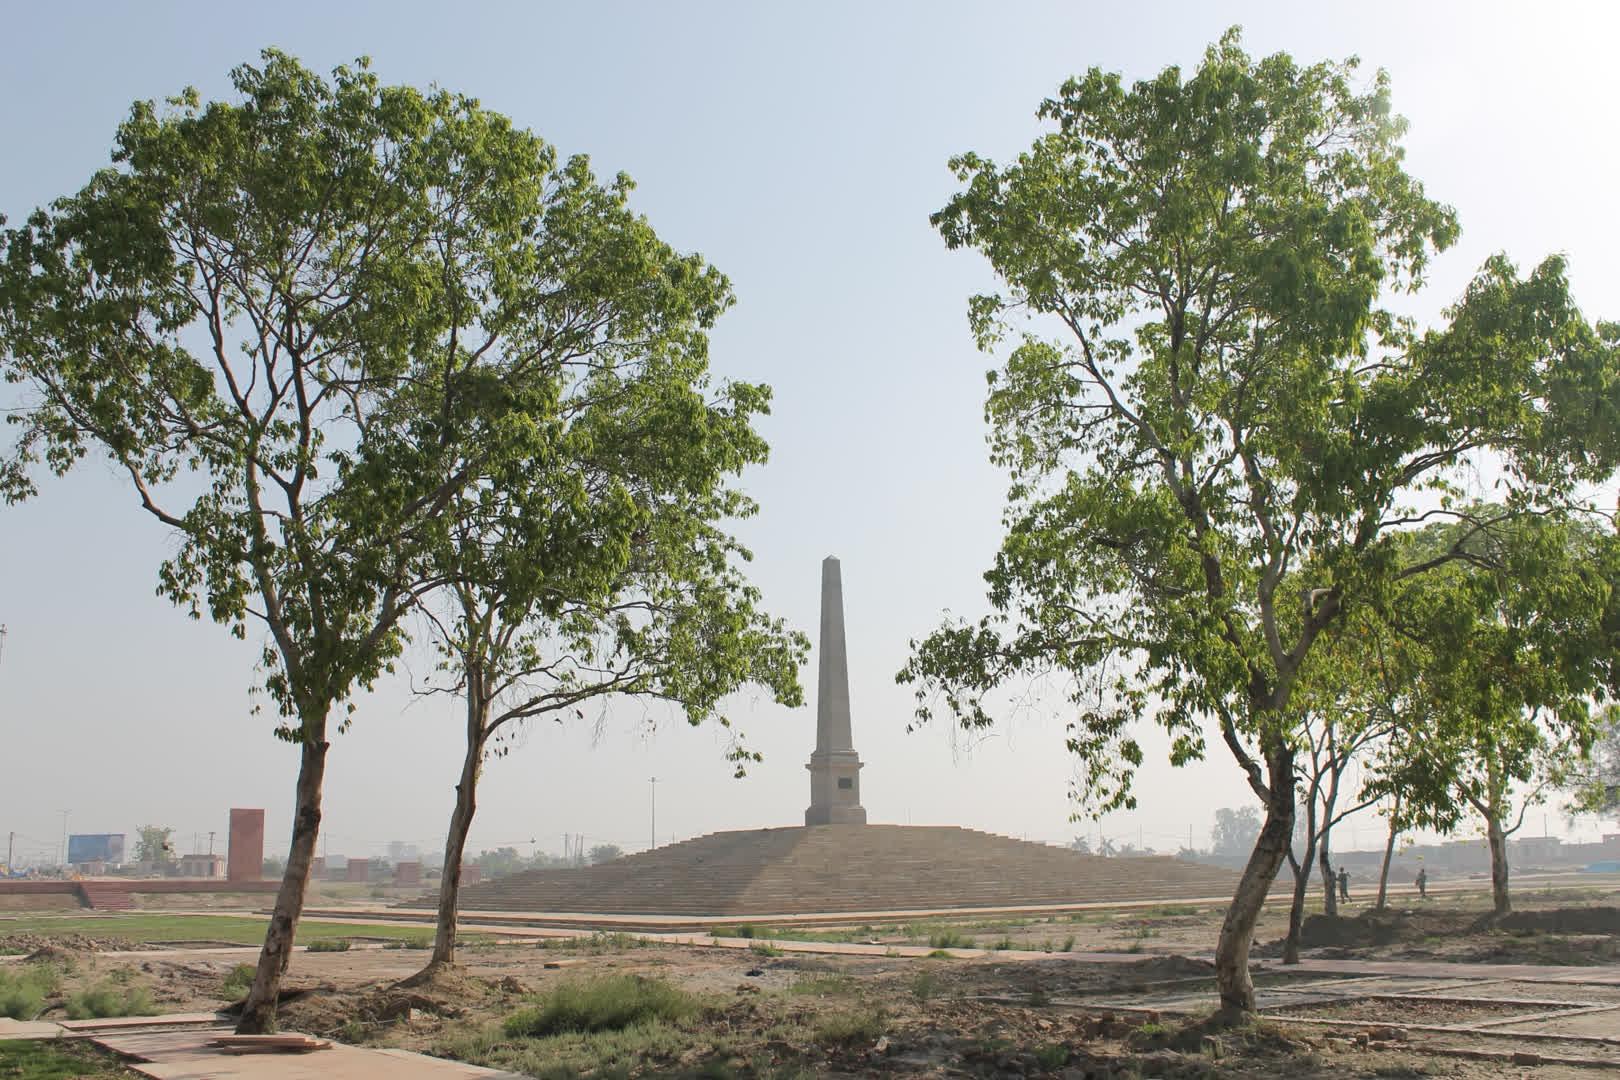 कोरोनेशन पार्क और उसके दिल्ली दरबार